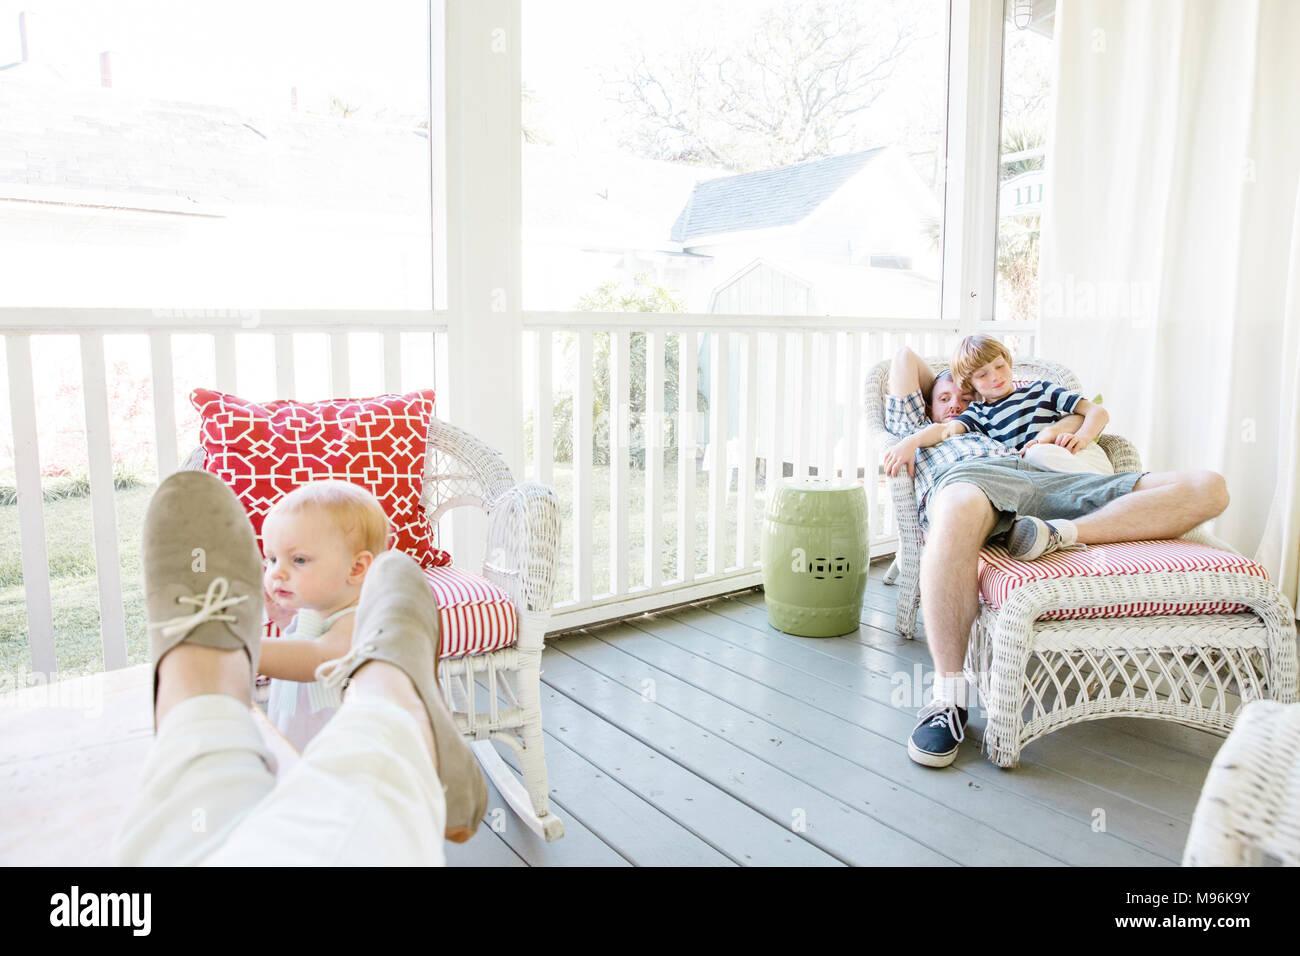 Relajarse en familia porche Imagen De Stock